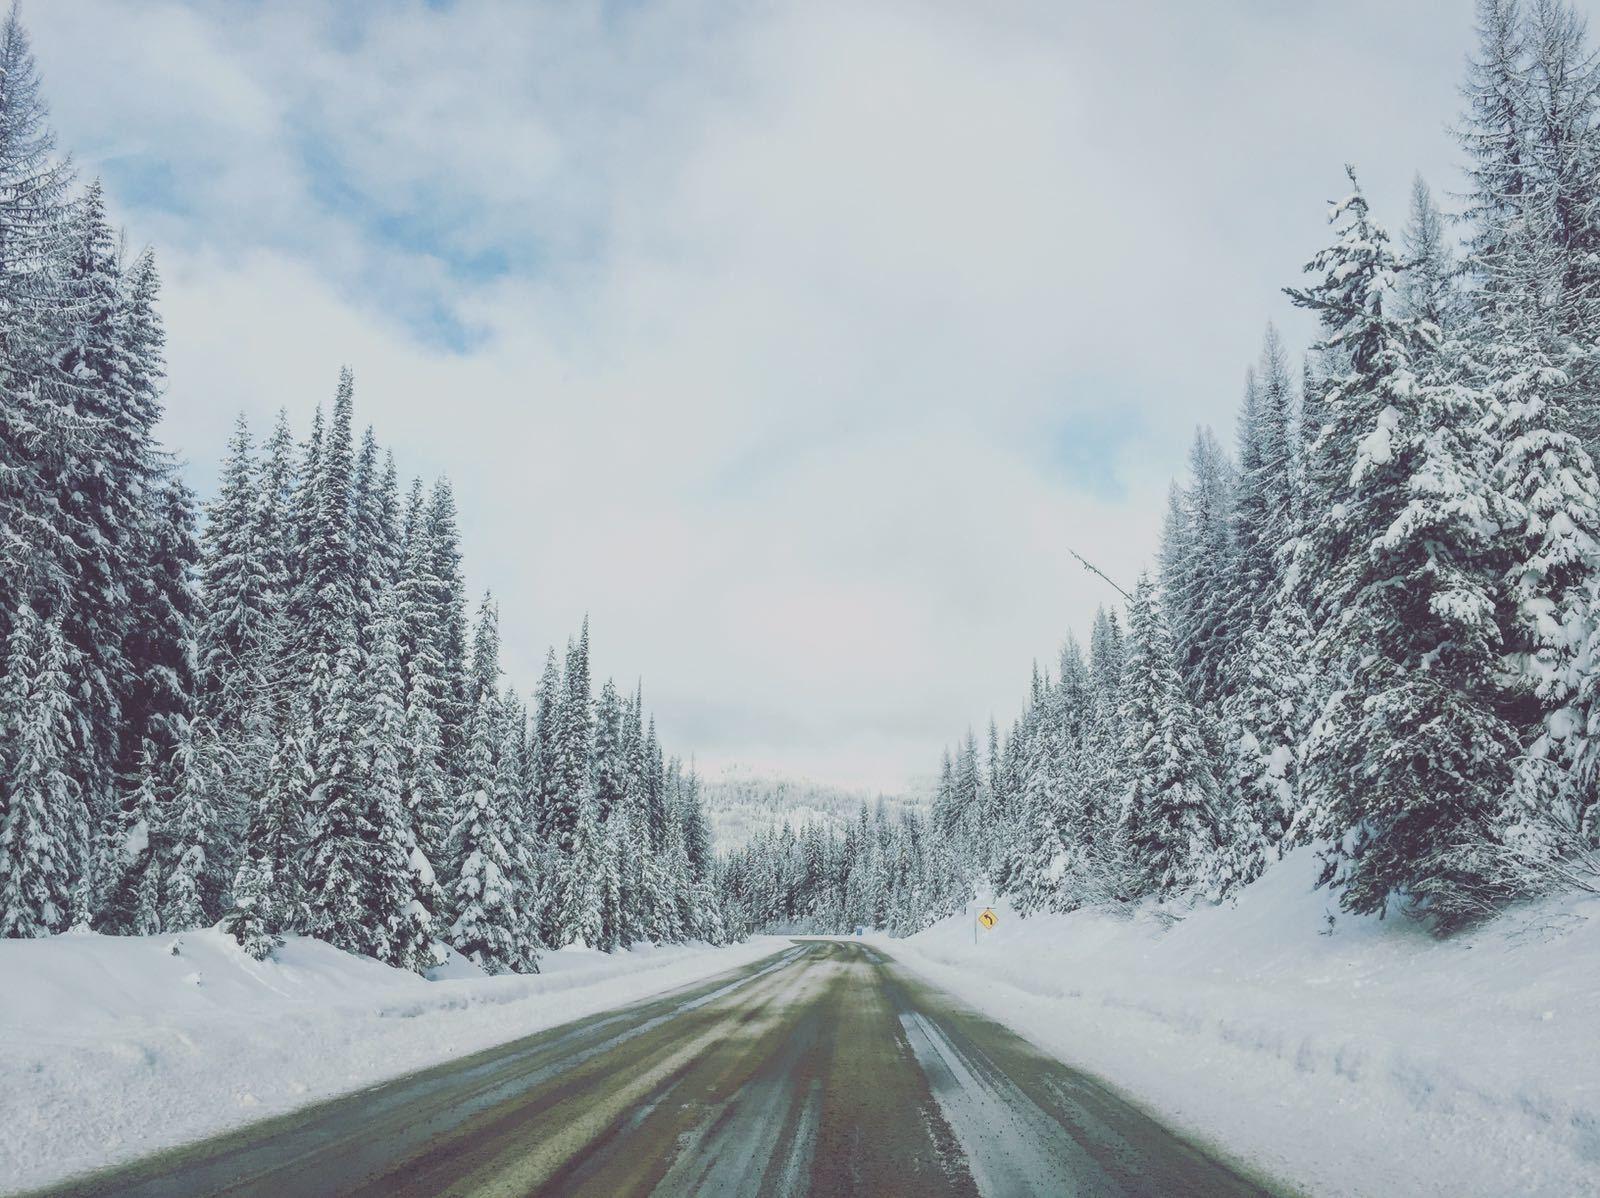 Carretera hacia Revelstoke